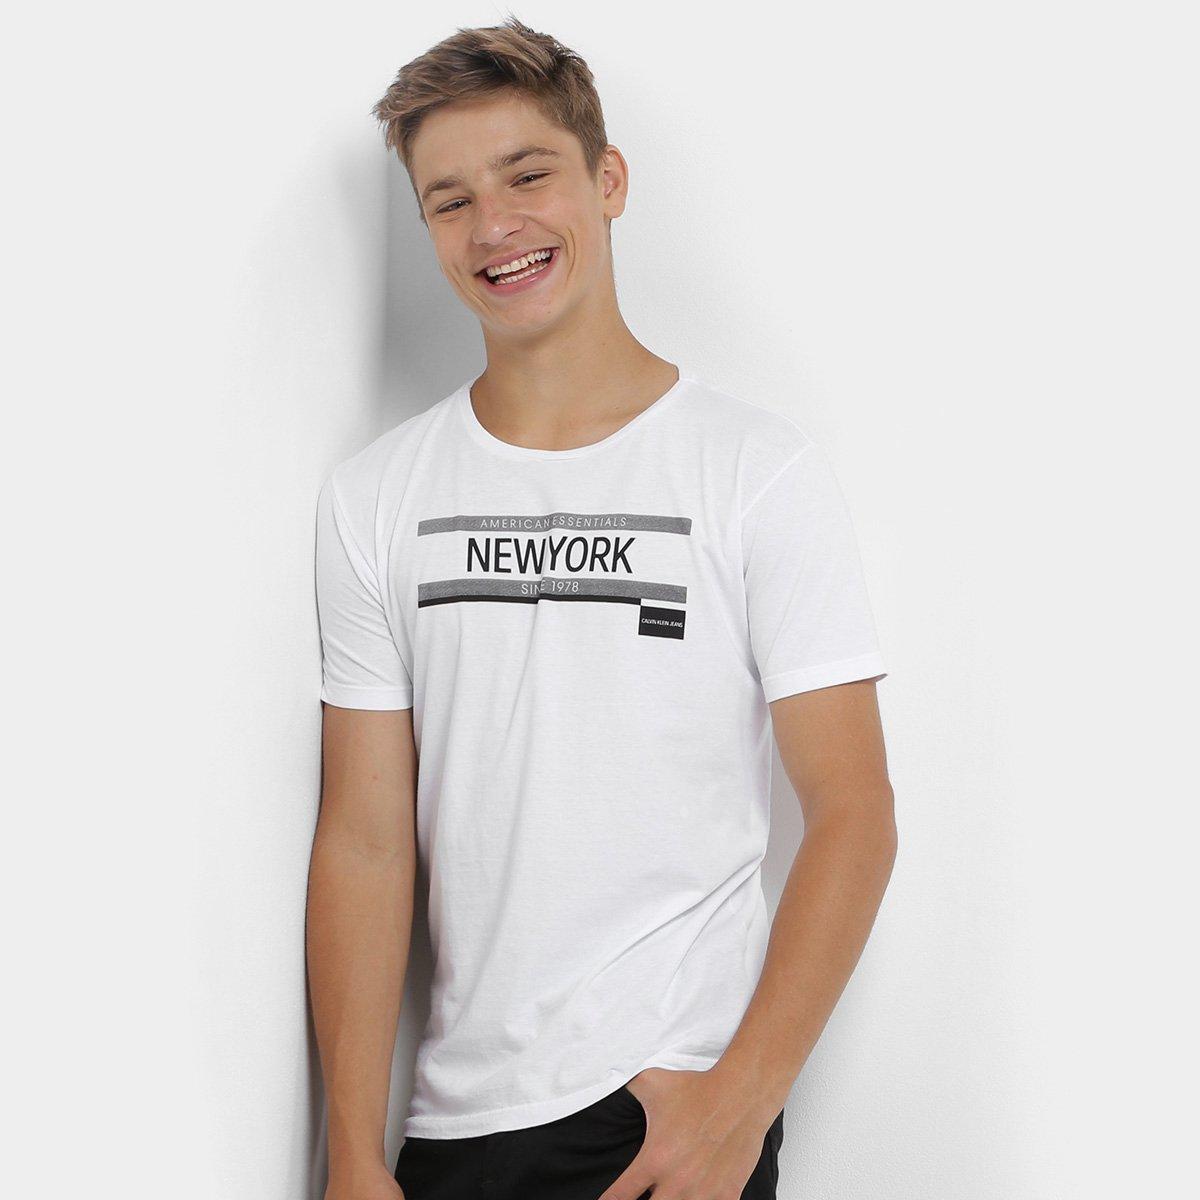 20%OFF Camiseta Infantil Calvin Klein Estampada Masculina 2acf76a2095be